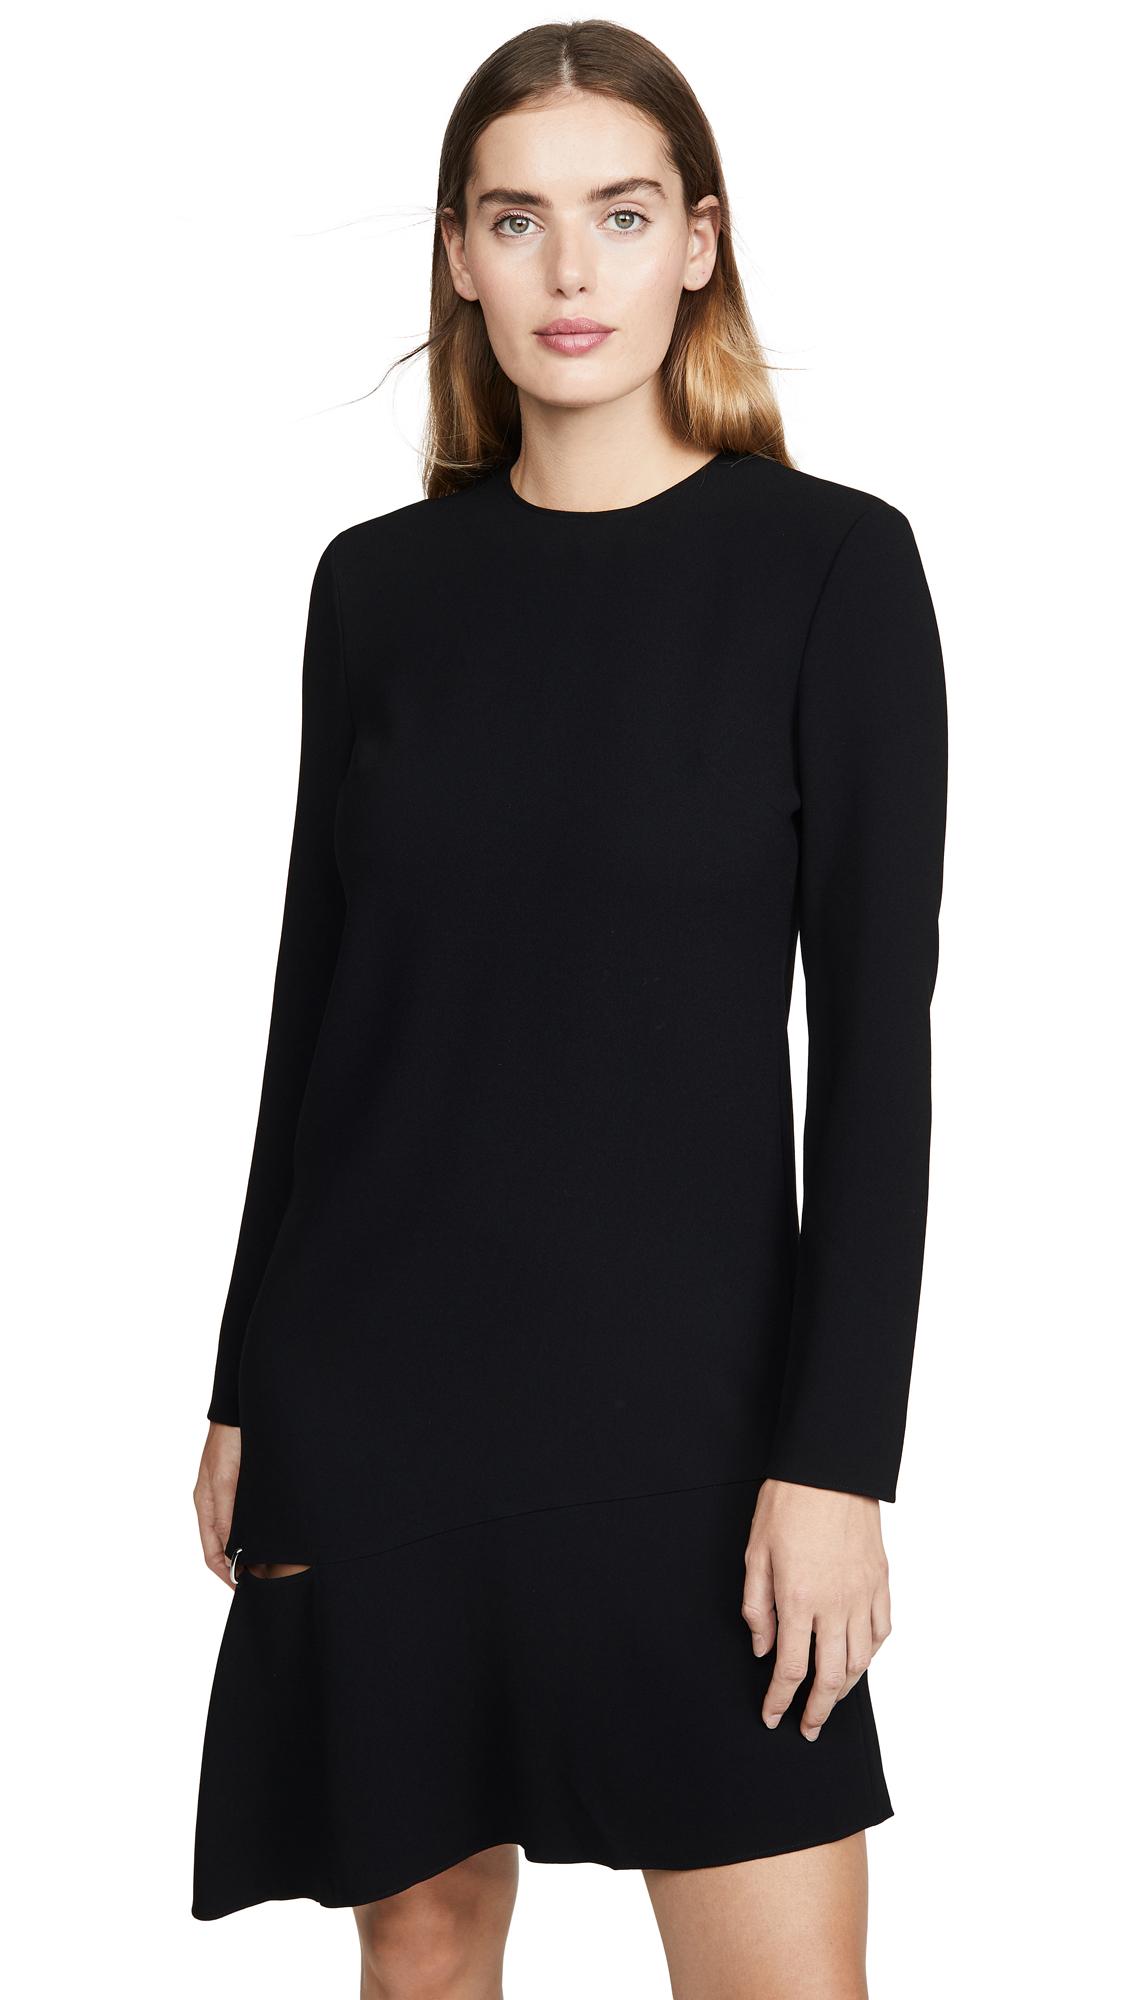 Tibi Triacetate Shift Dress With Detached Hem In Black